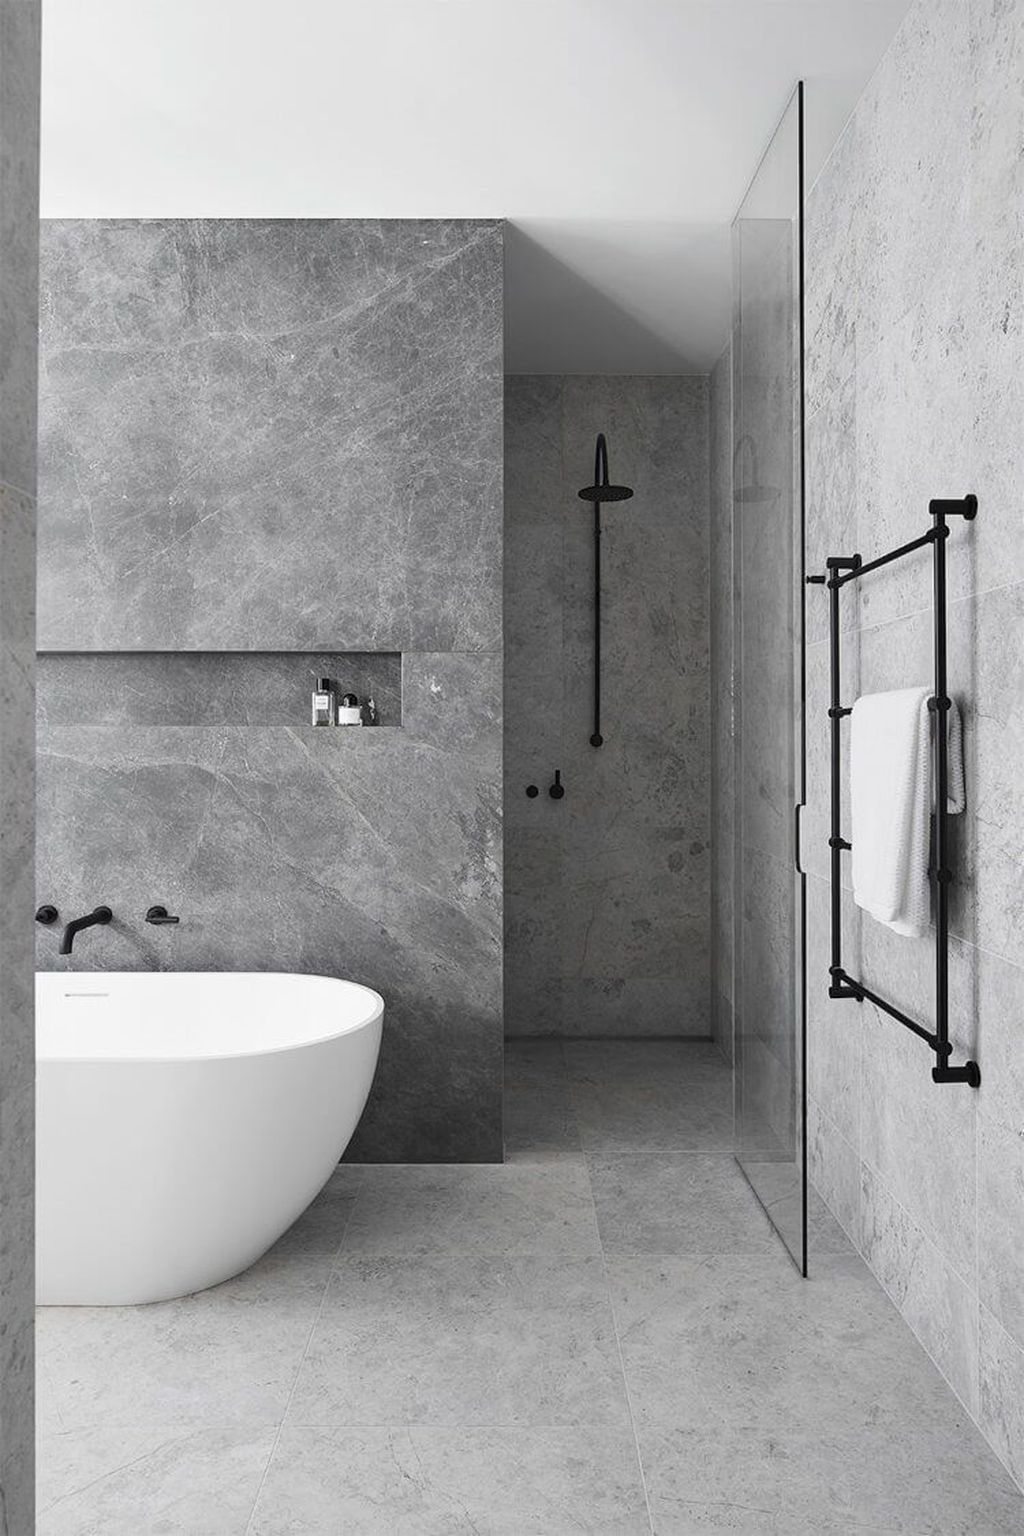 36 Elegant Industrial Bathroom Design Ideas On A Budget Modern Bathroom Design Minimalist Bathroom Design Bathroom Interior